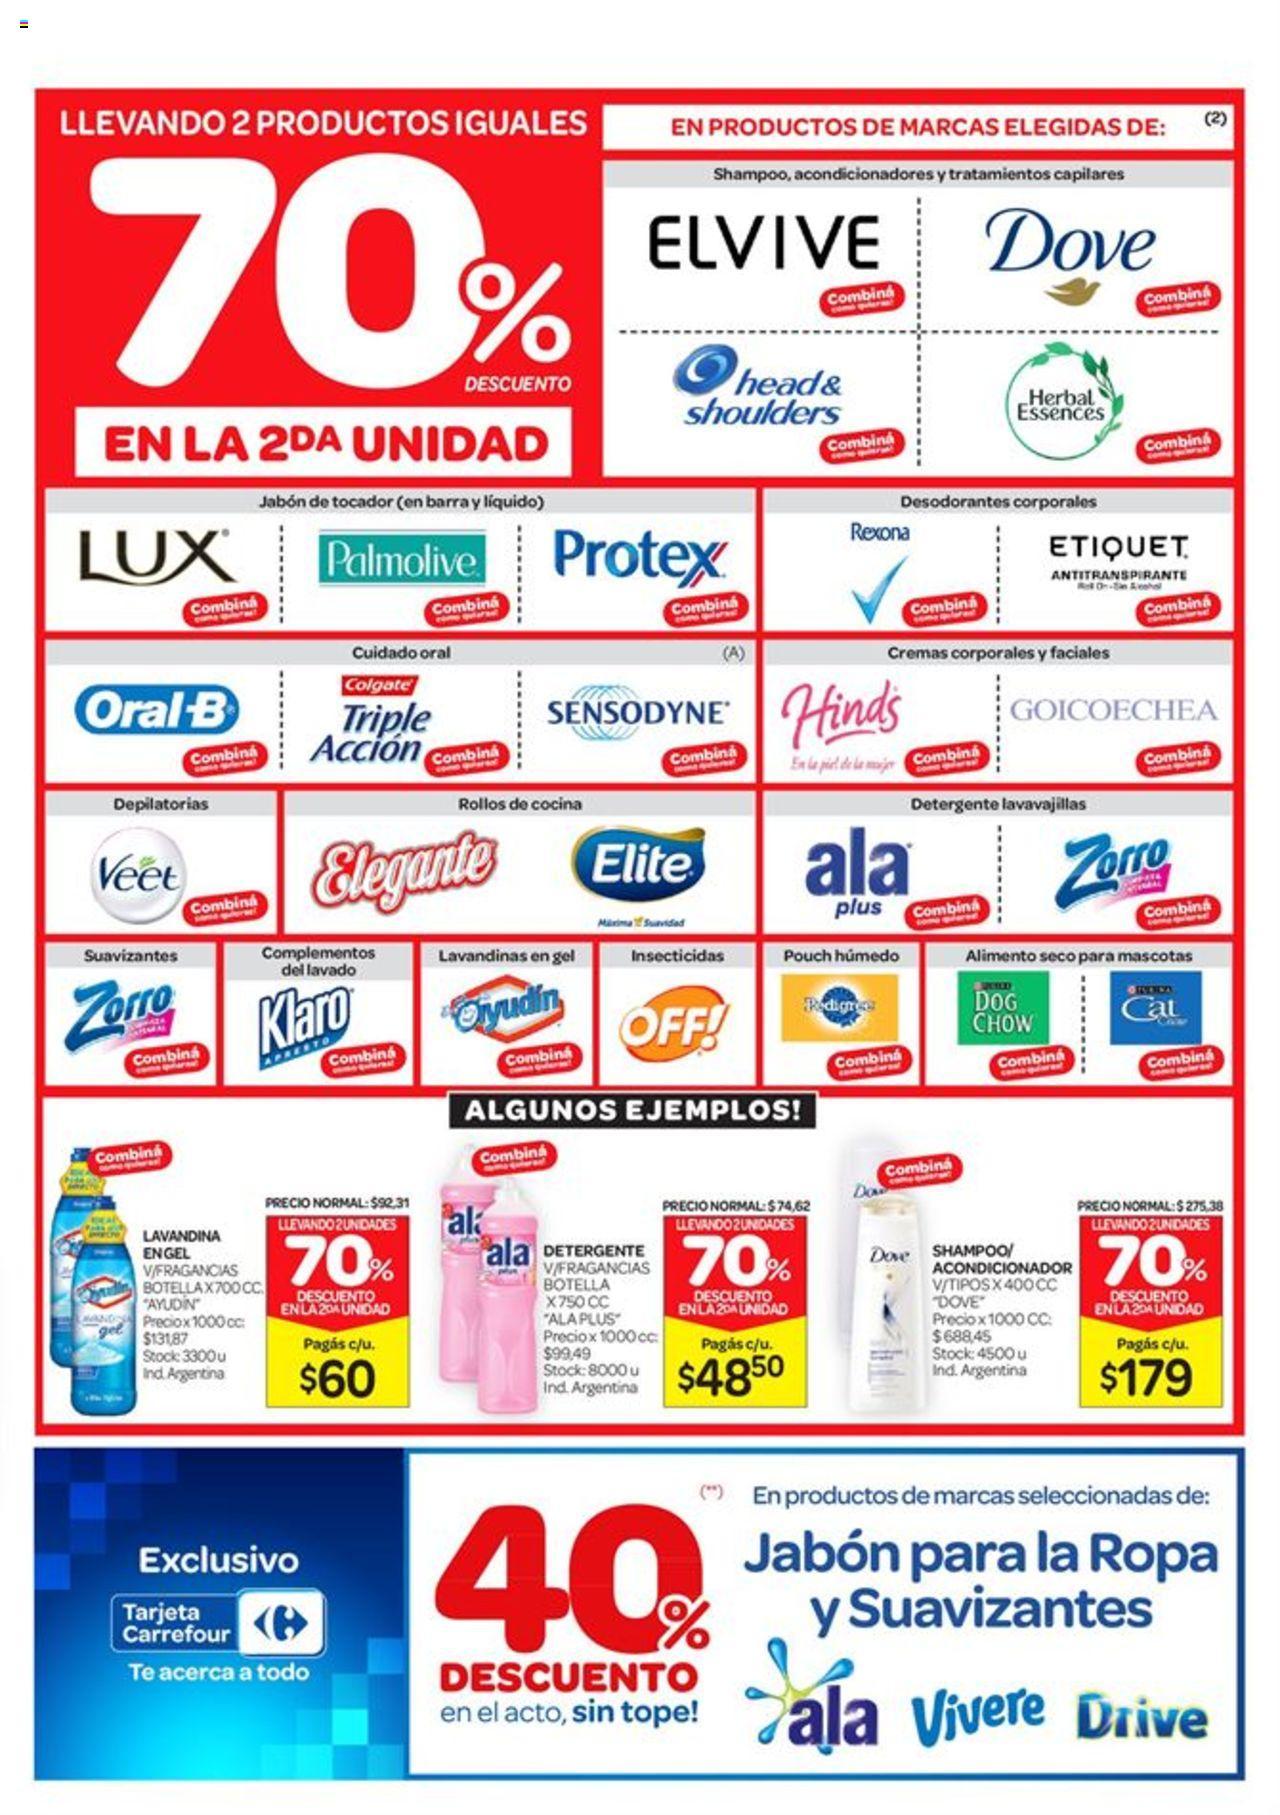 Carrefour - Catálogo válido desde el 11/03/2020 número de página 1 | Página: 7